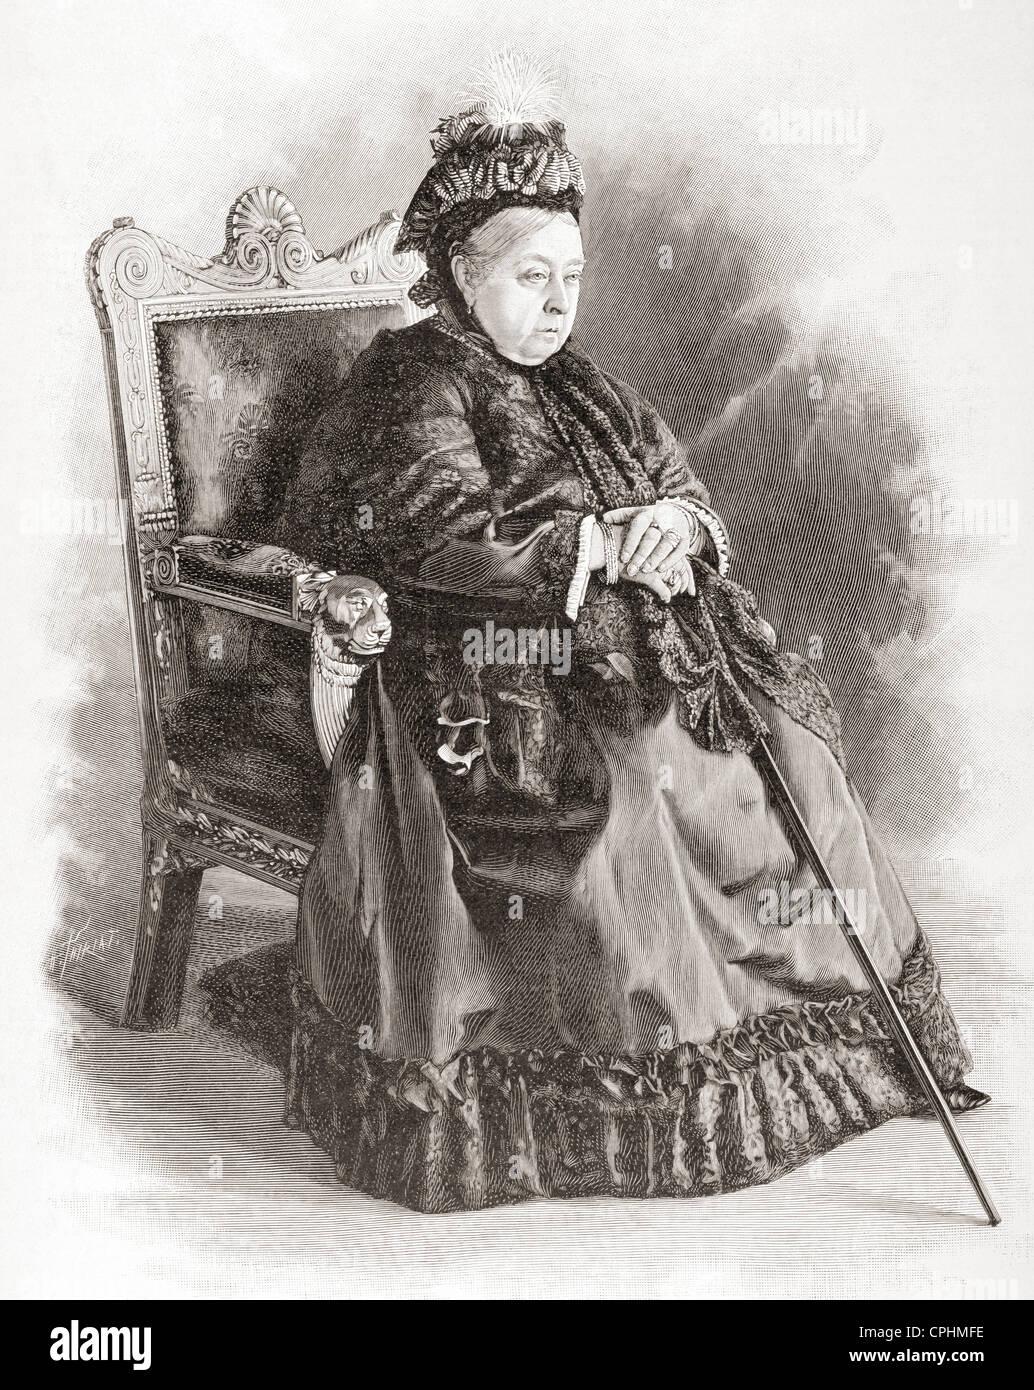 Queen Victoria, Alexandrina Victoria, 1819 – 1901. - Stock Image